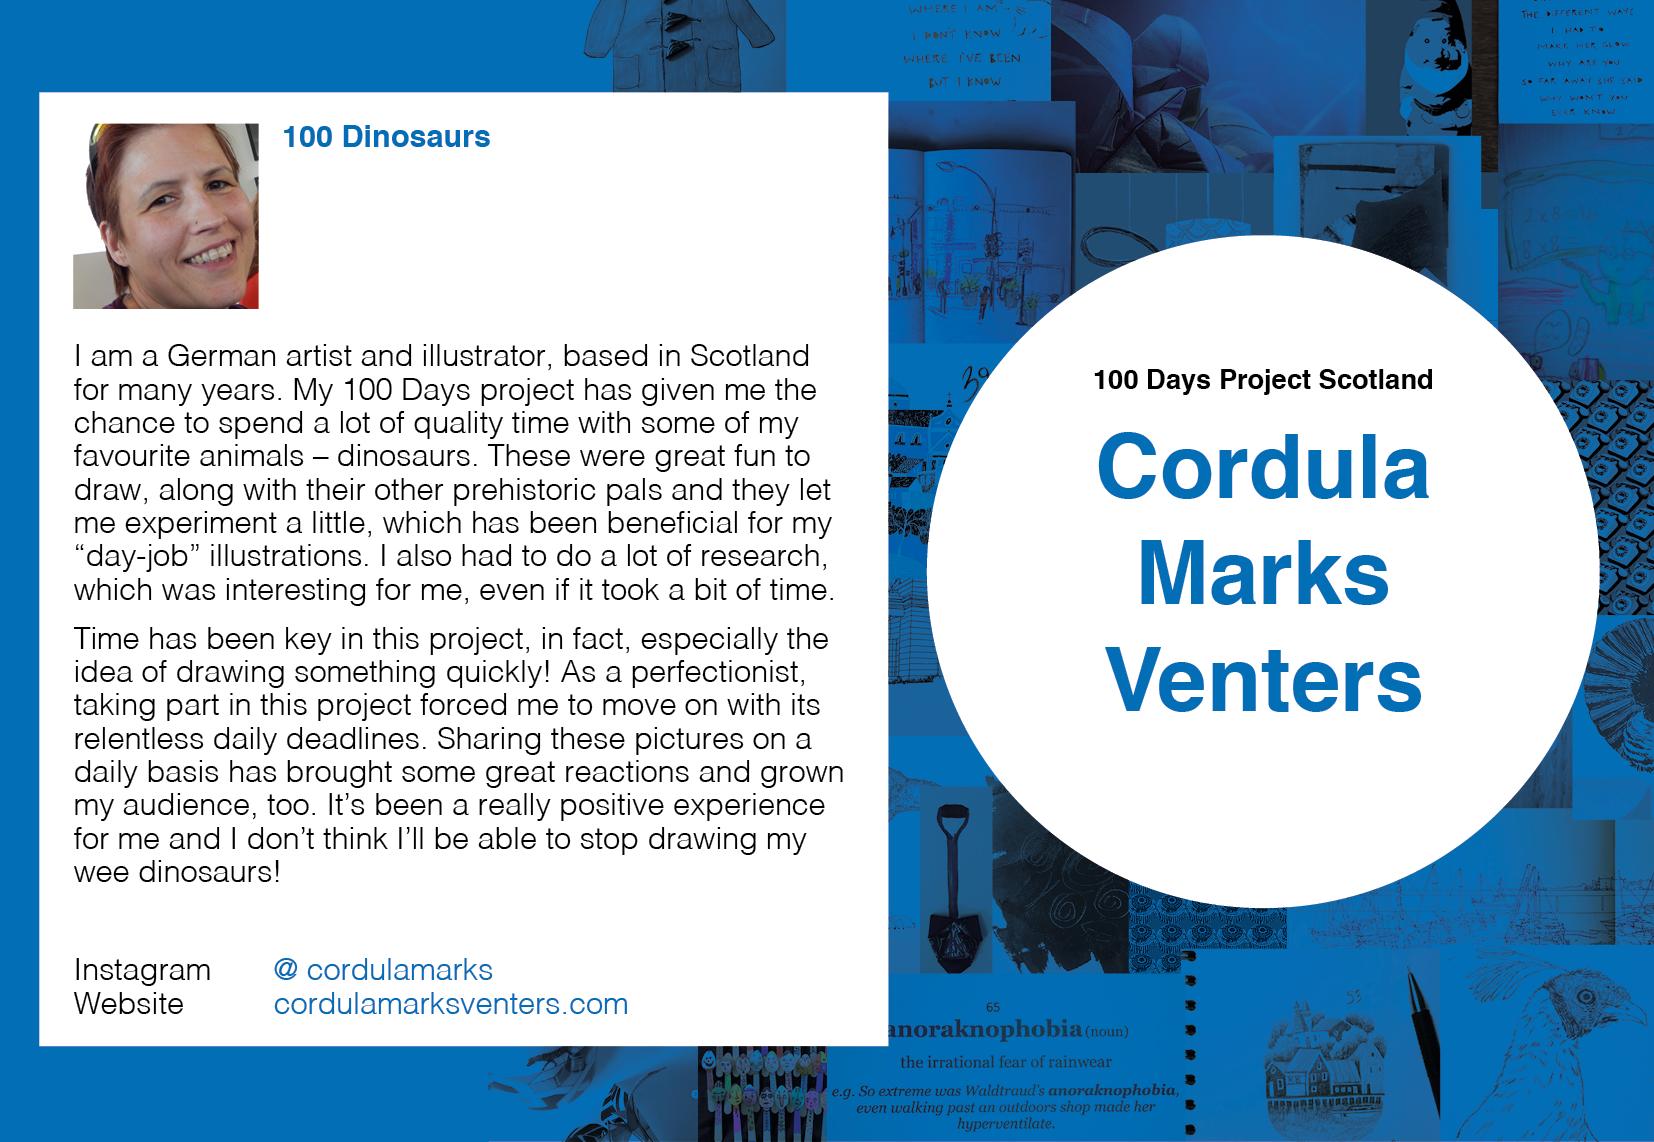 Cordula Marks Venters